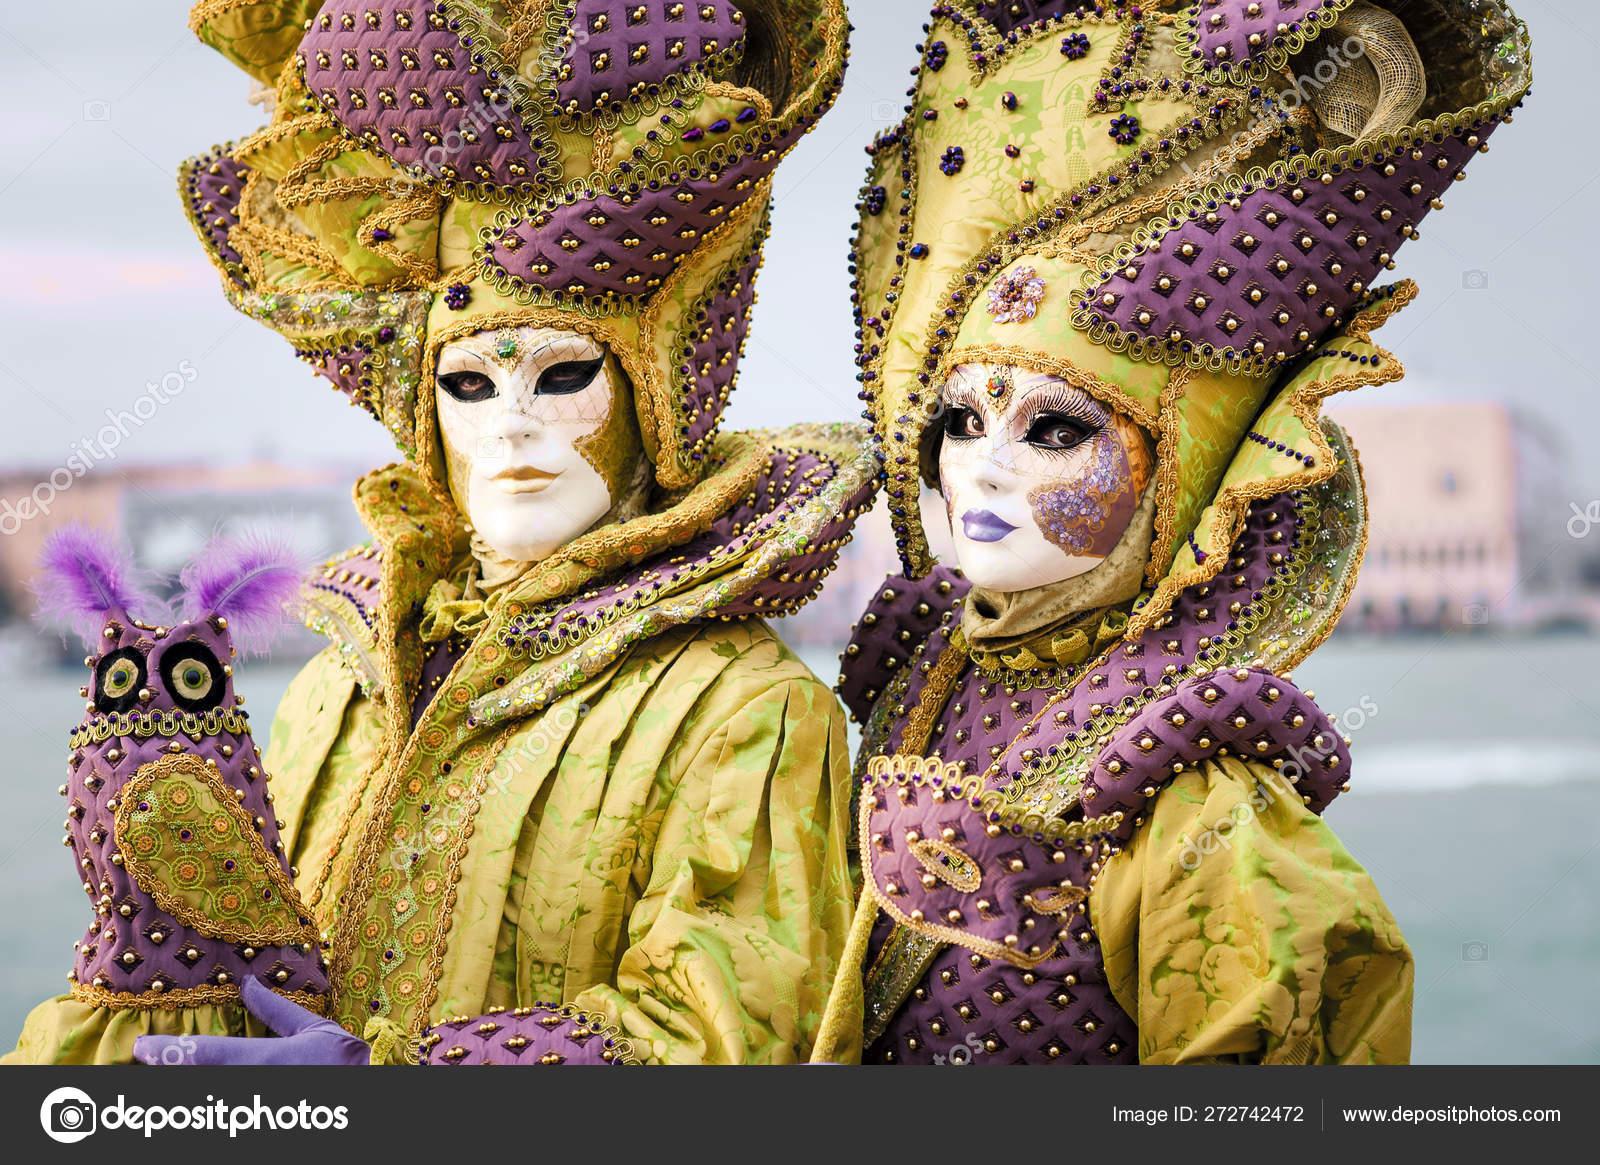 People Masks Costumes Harbor Carnival Venice Italy \u2013 Stock